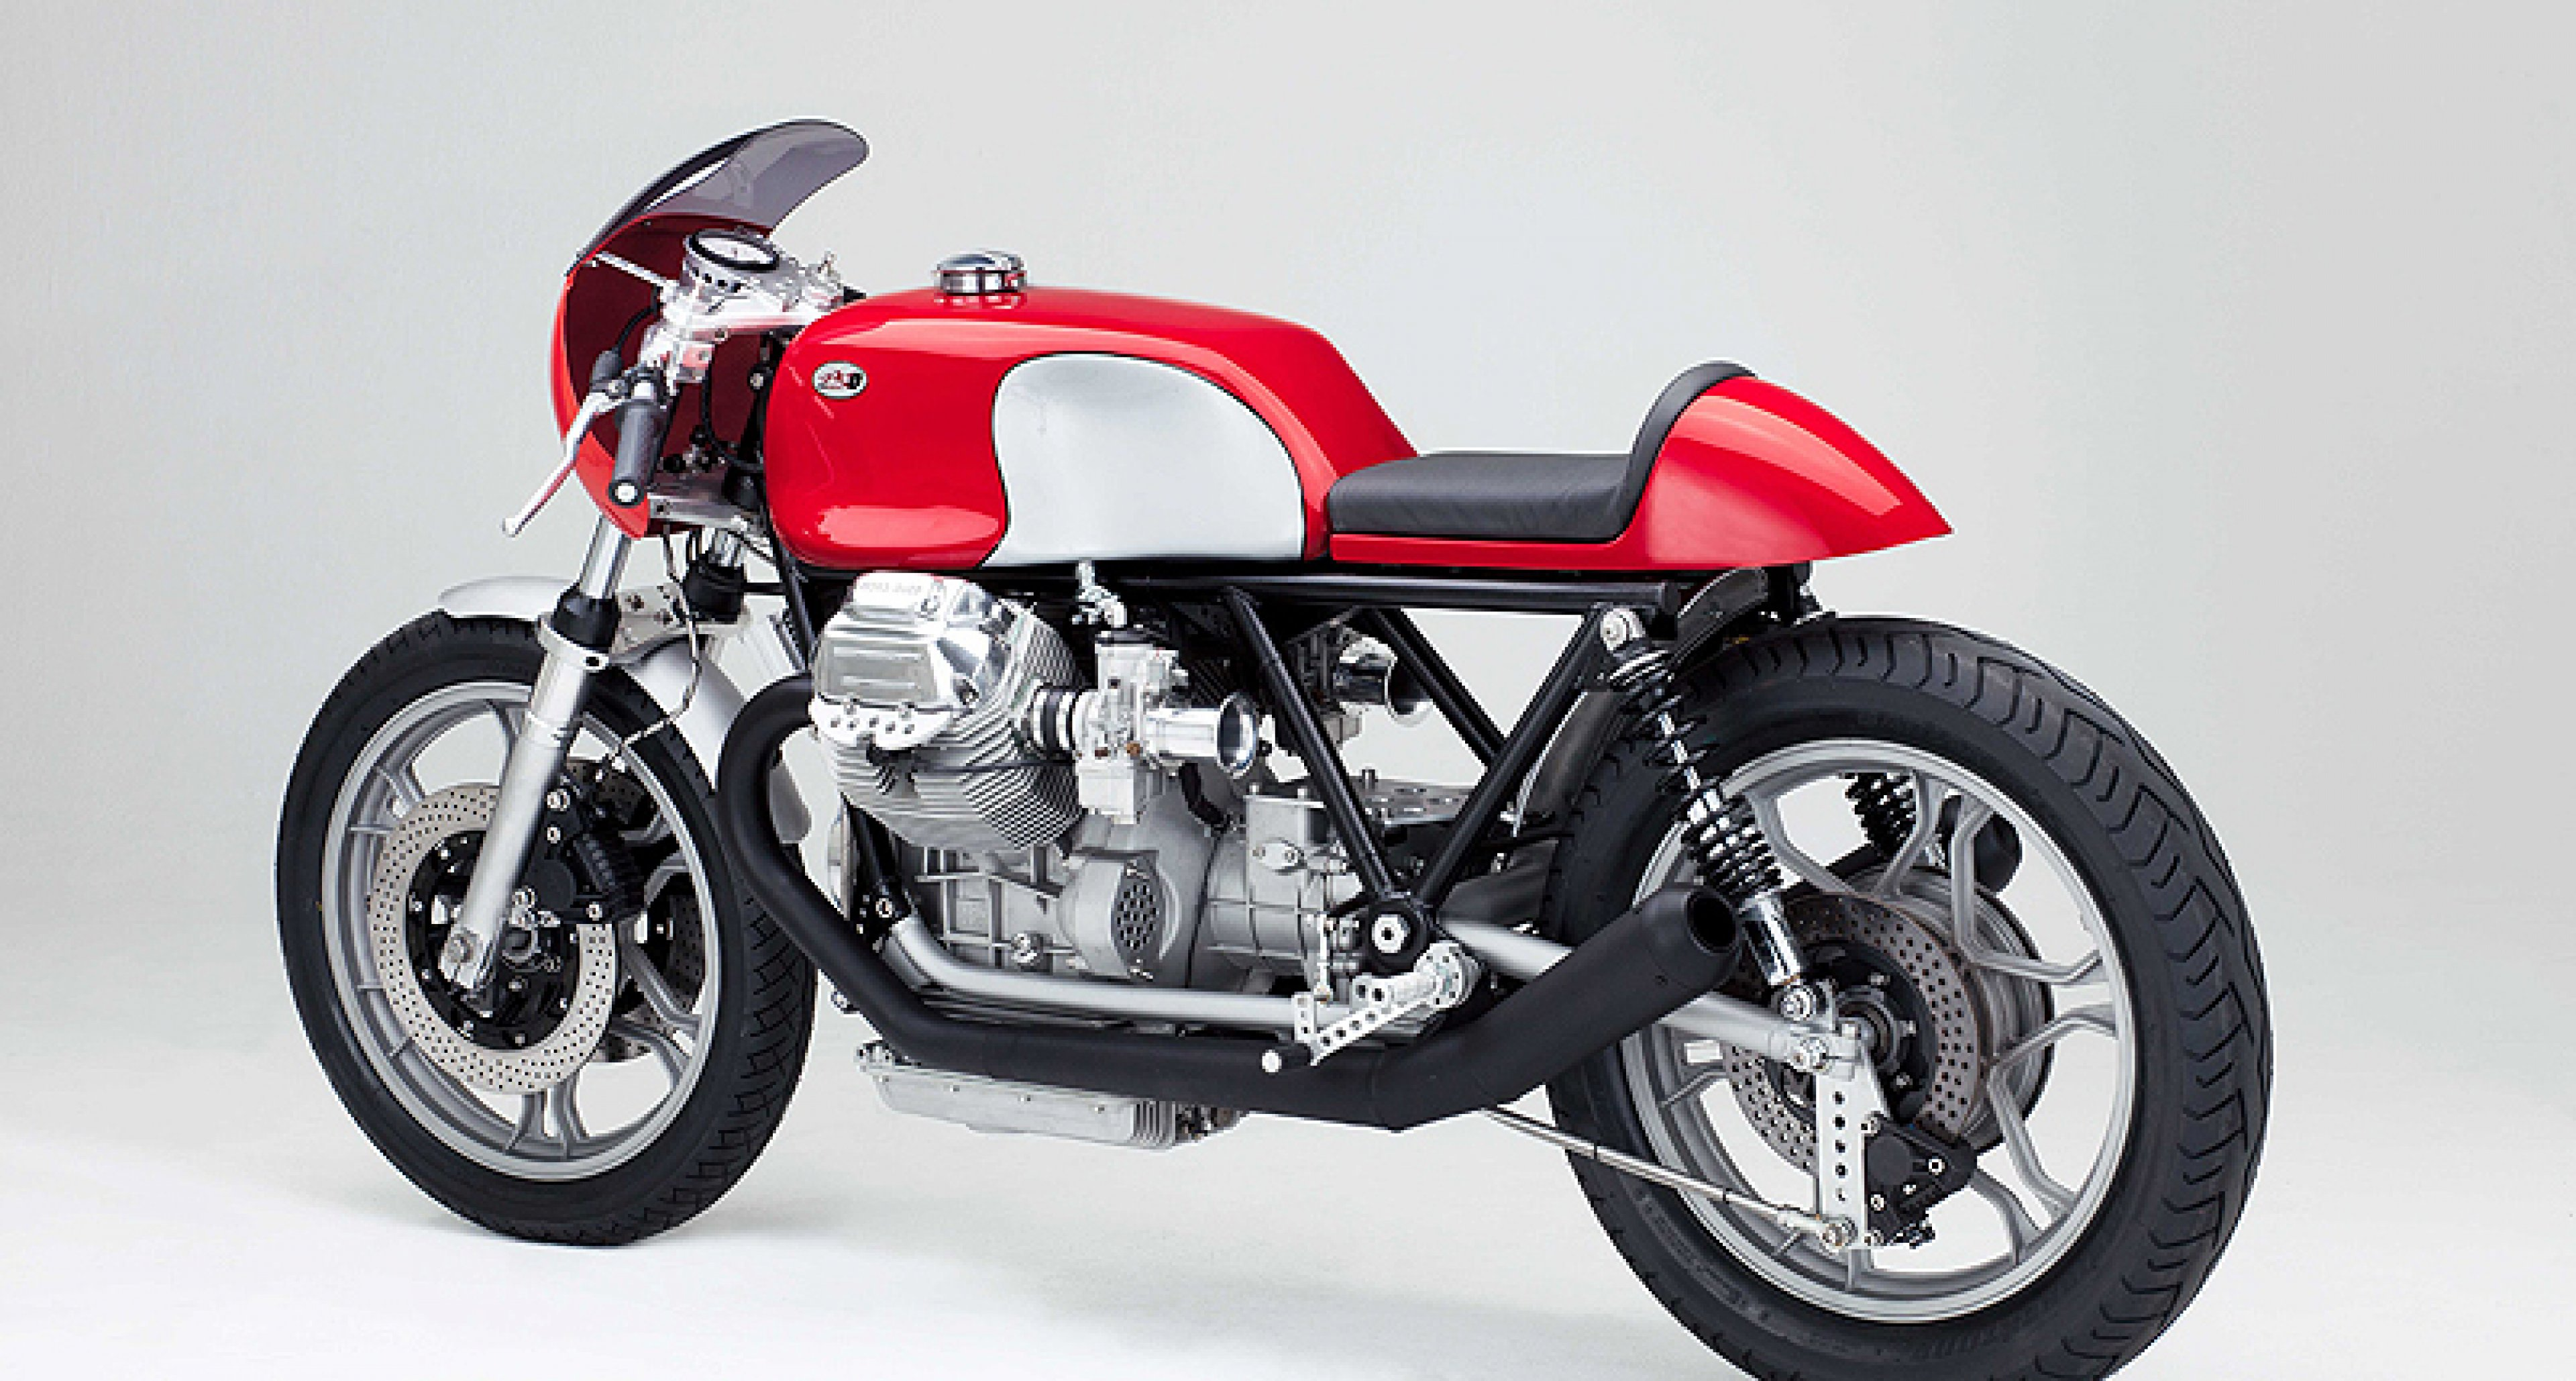 Moto Guzzi Cafe Racer Kaffeemaschine Nummer 6 Classic Driver Magazine